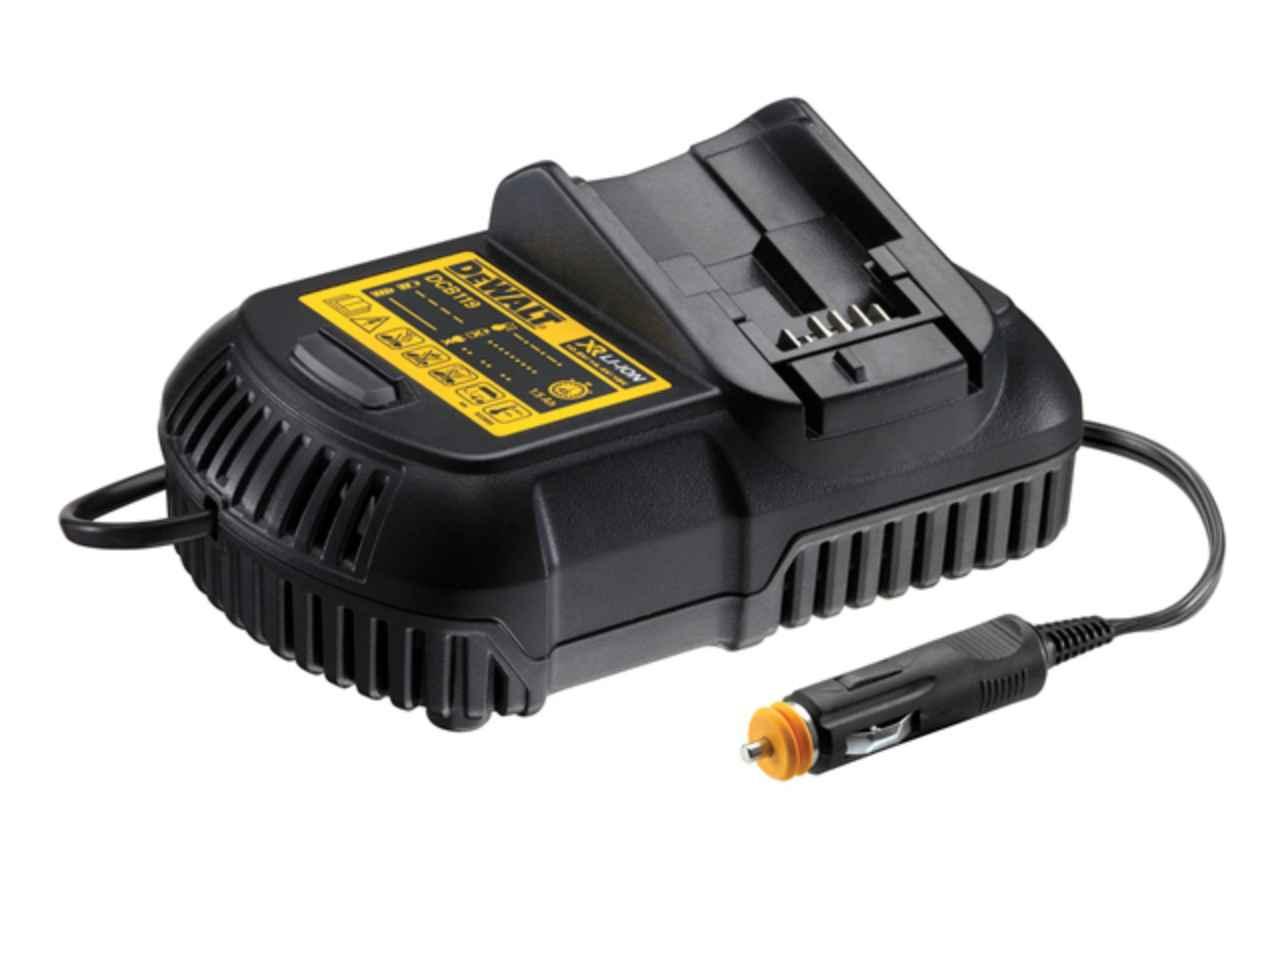 Makita Dc18rc 1 Li Ion 110v Fast Battery Charger